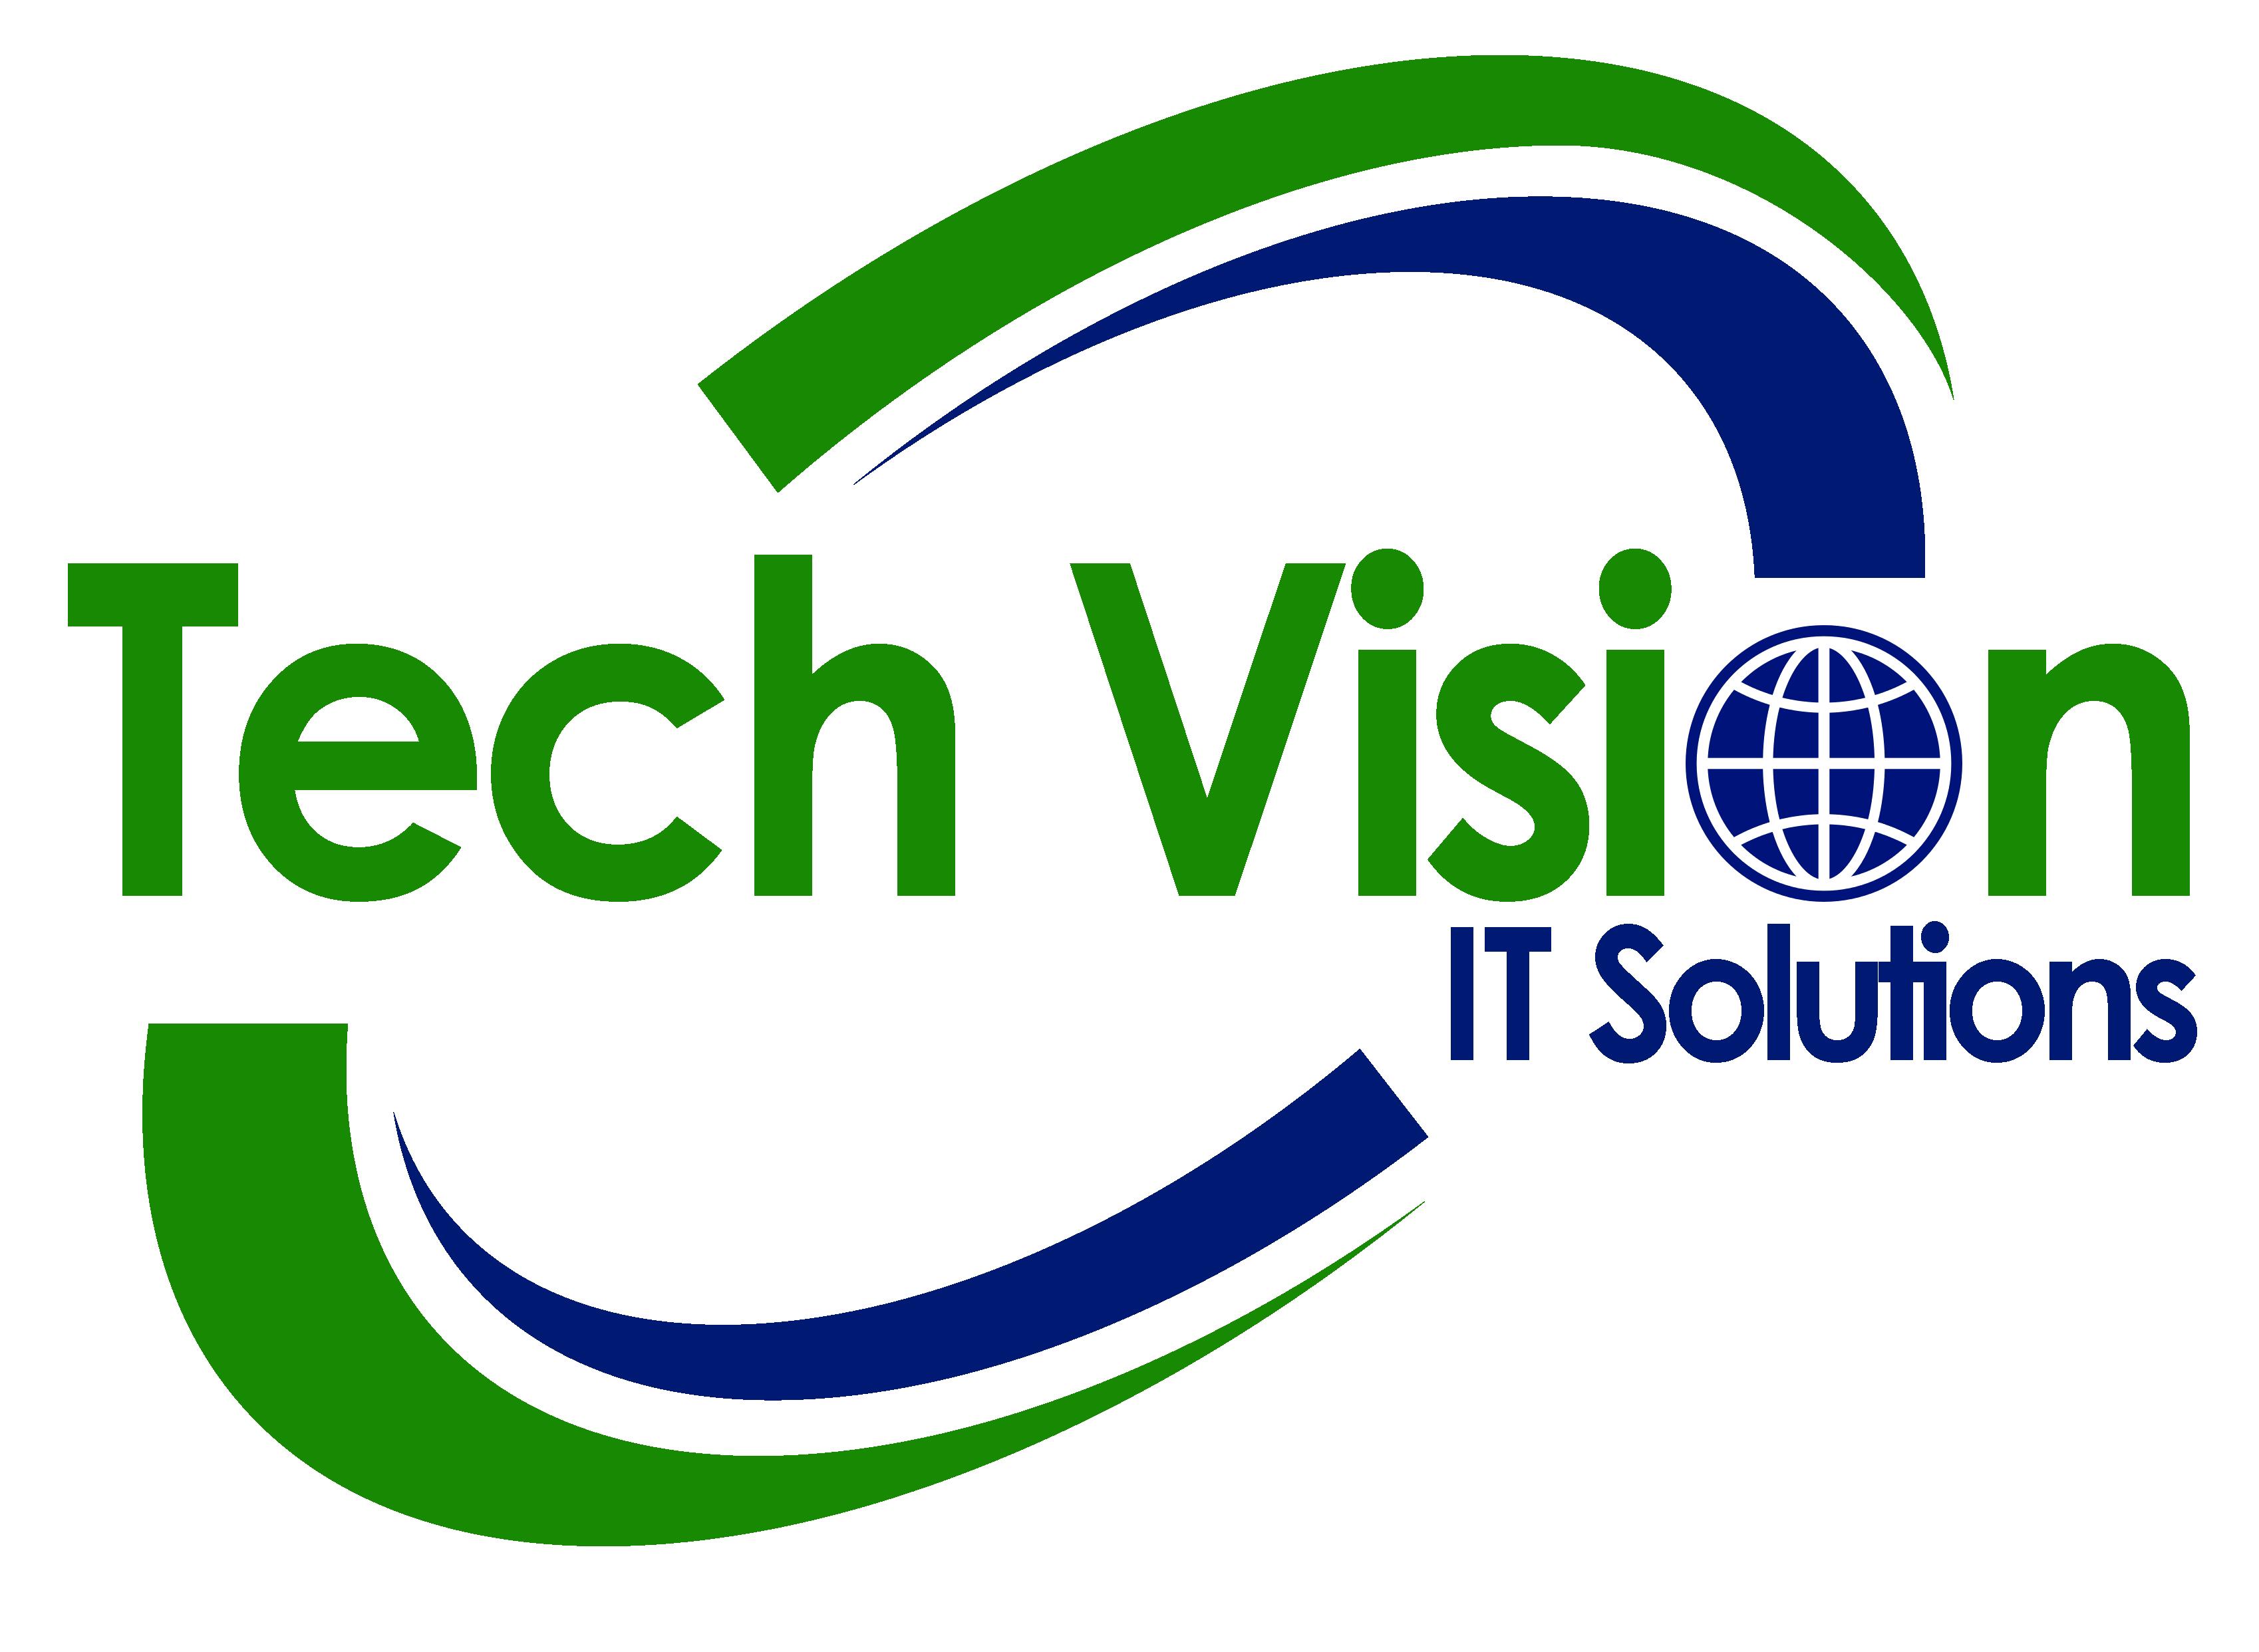 Future clipart vission. Tech vision it solutions